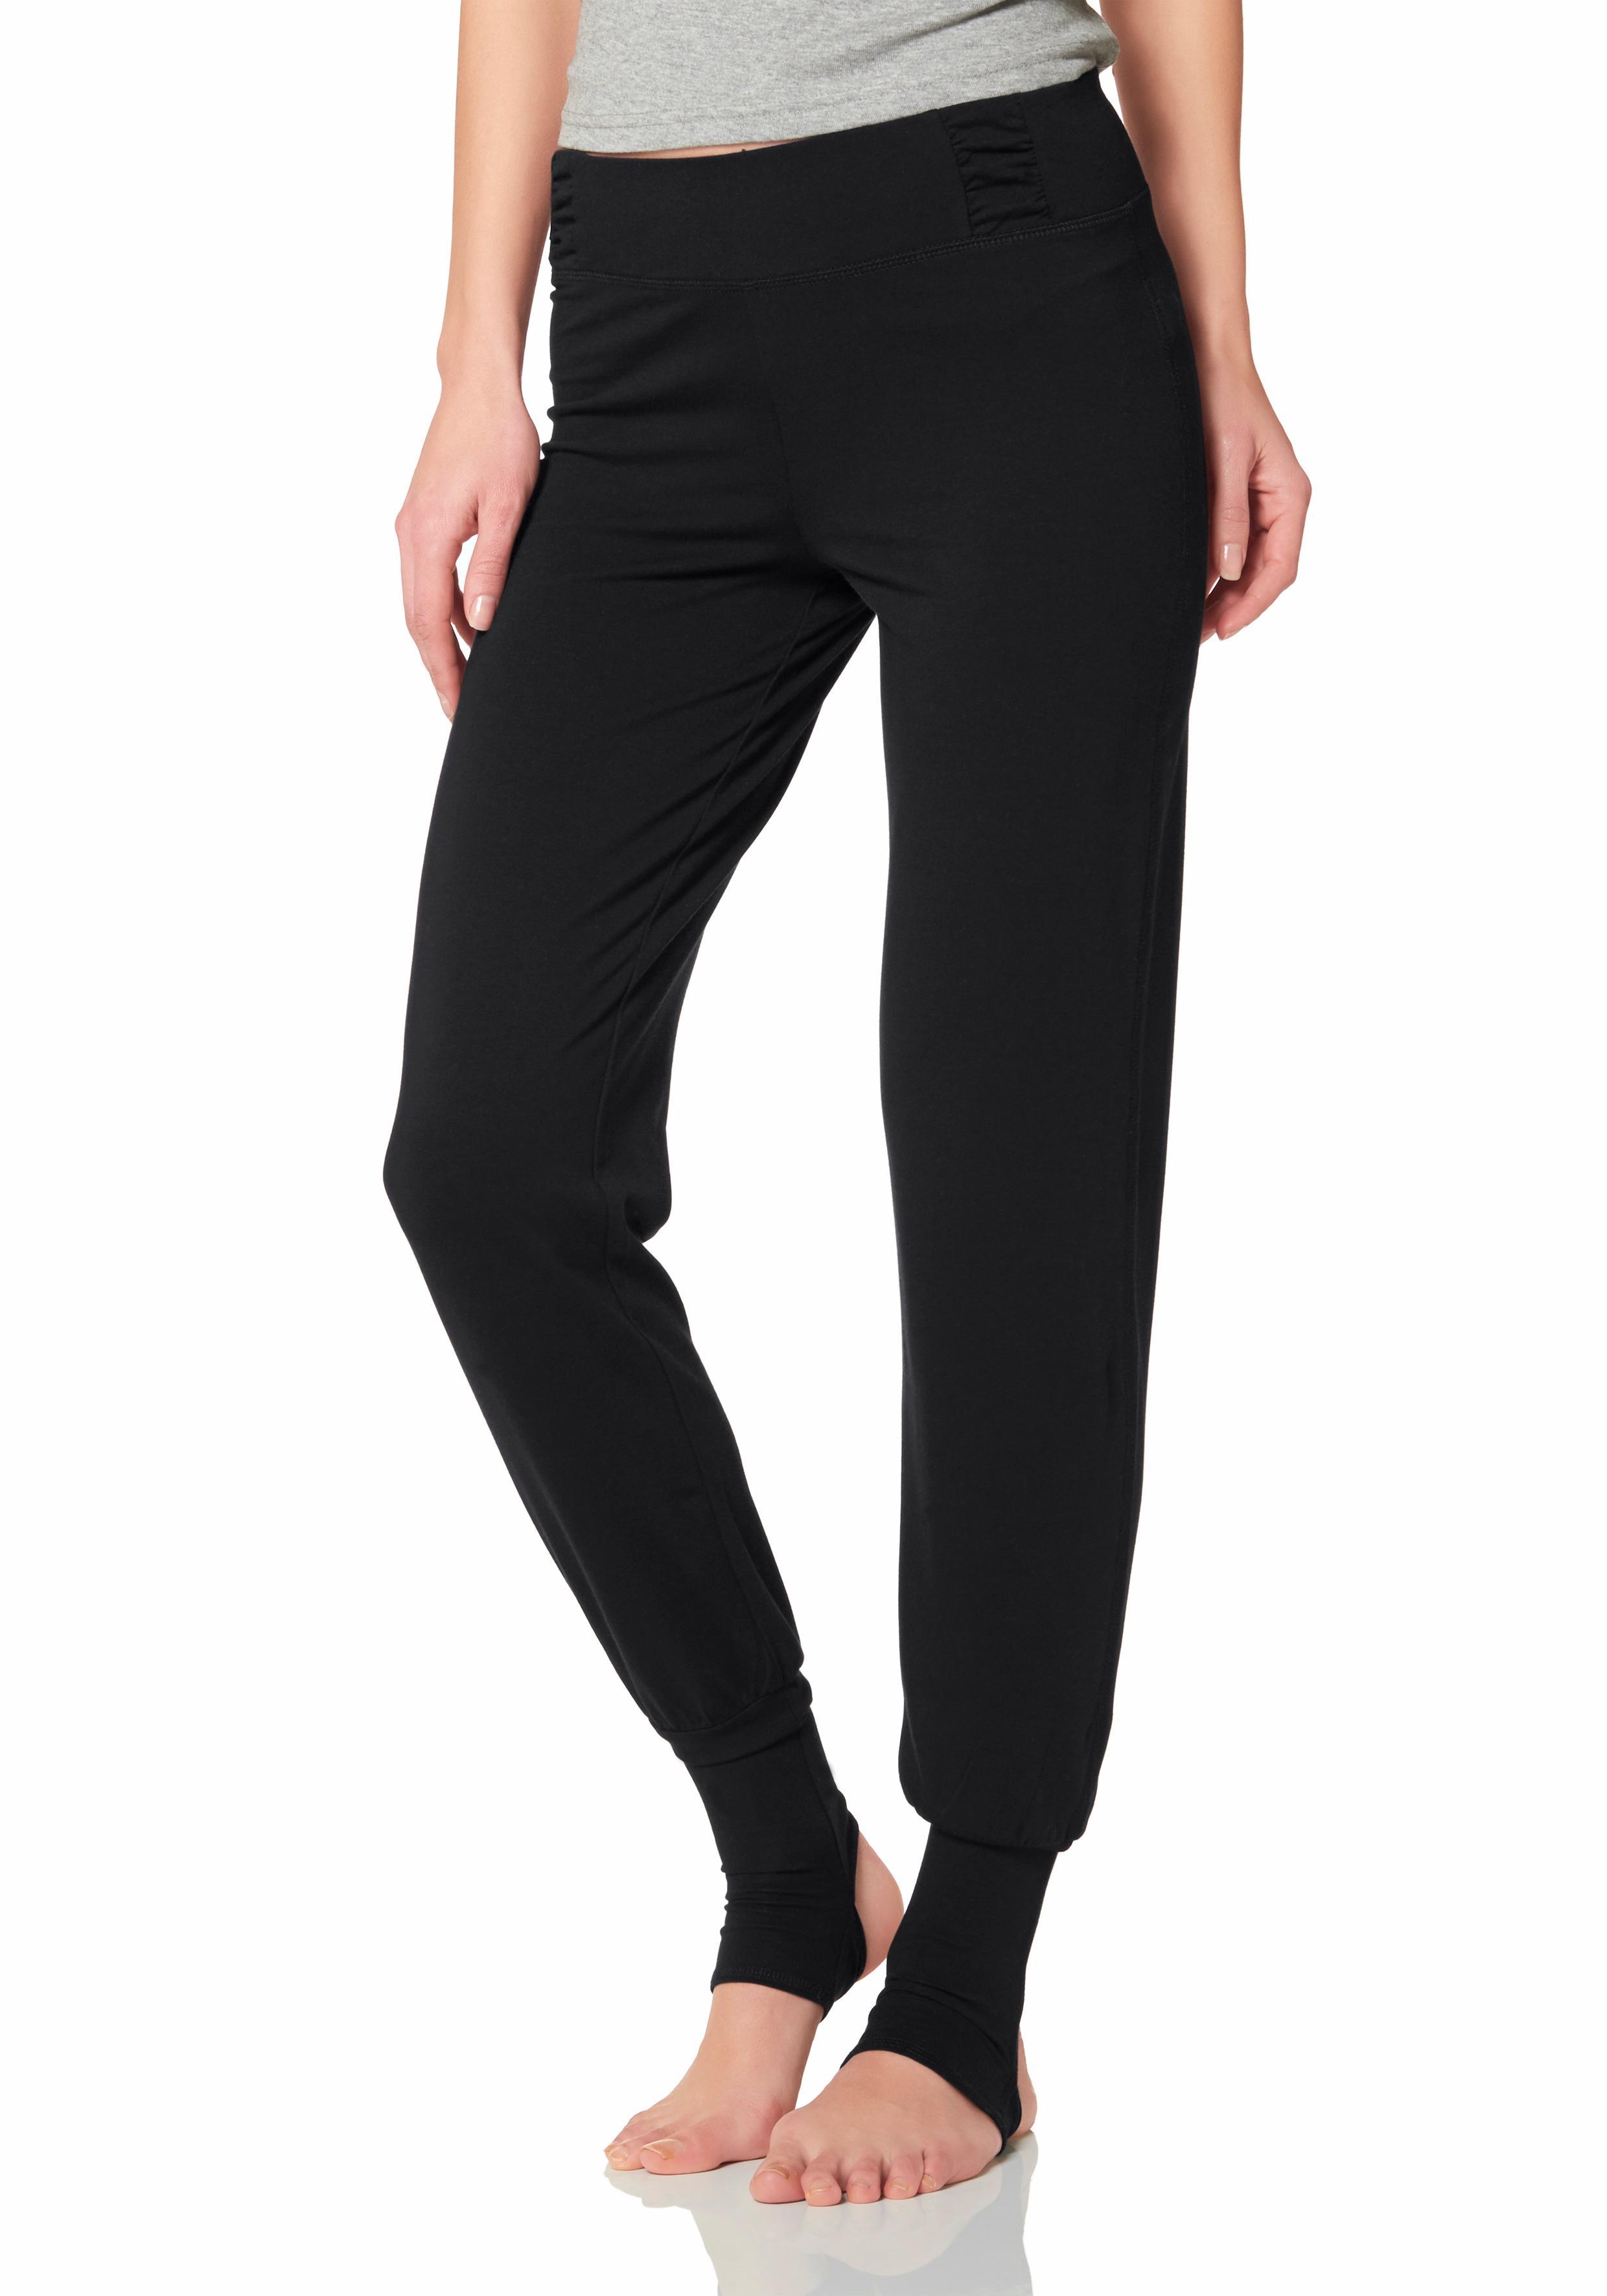 Ocean Sportswear Yogahose Yogapant black   Sportbekleidung > Sporthosen   Ocean Sportswear